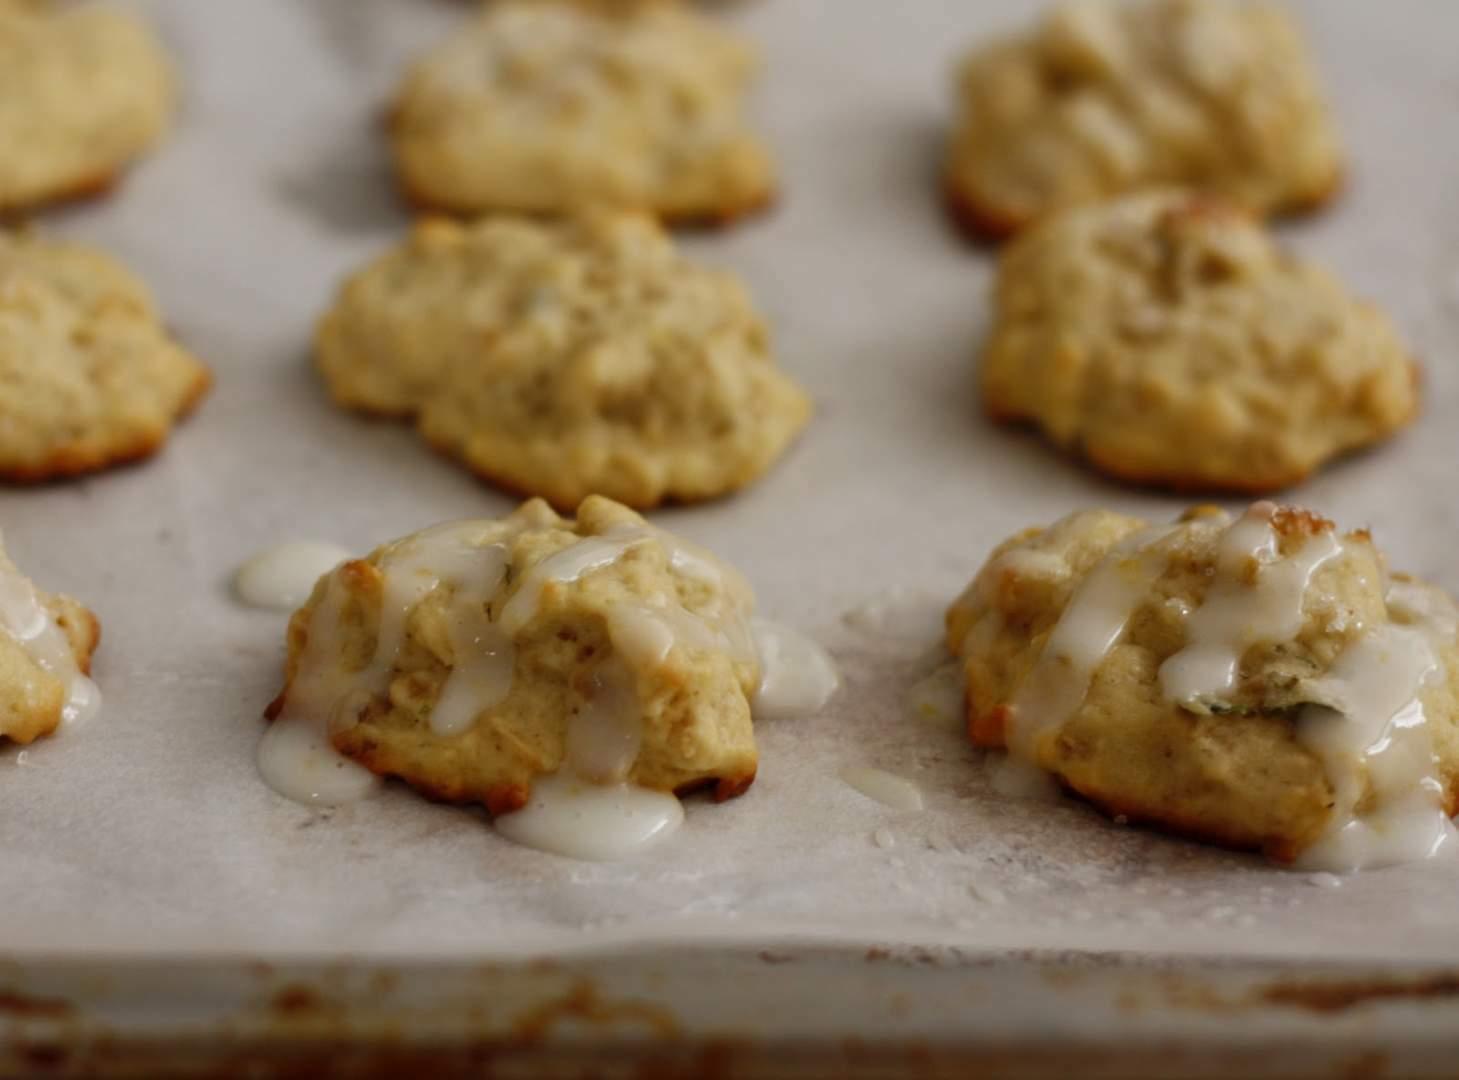 Lemon olive oil cookies, Recipe Petitchef